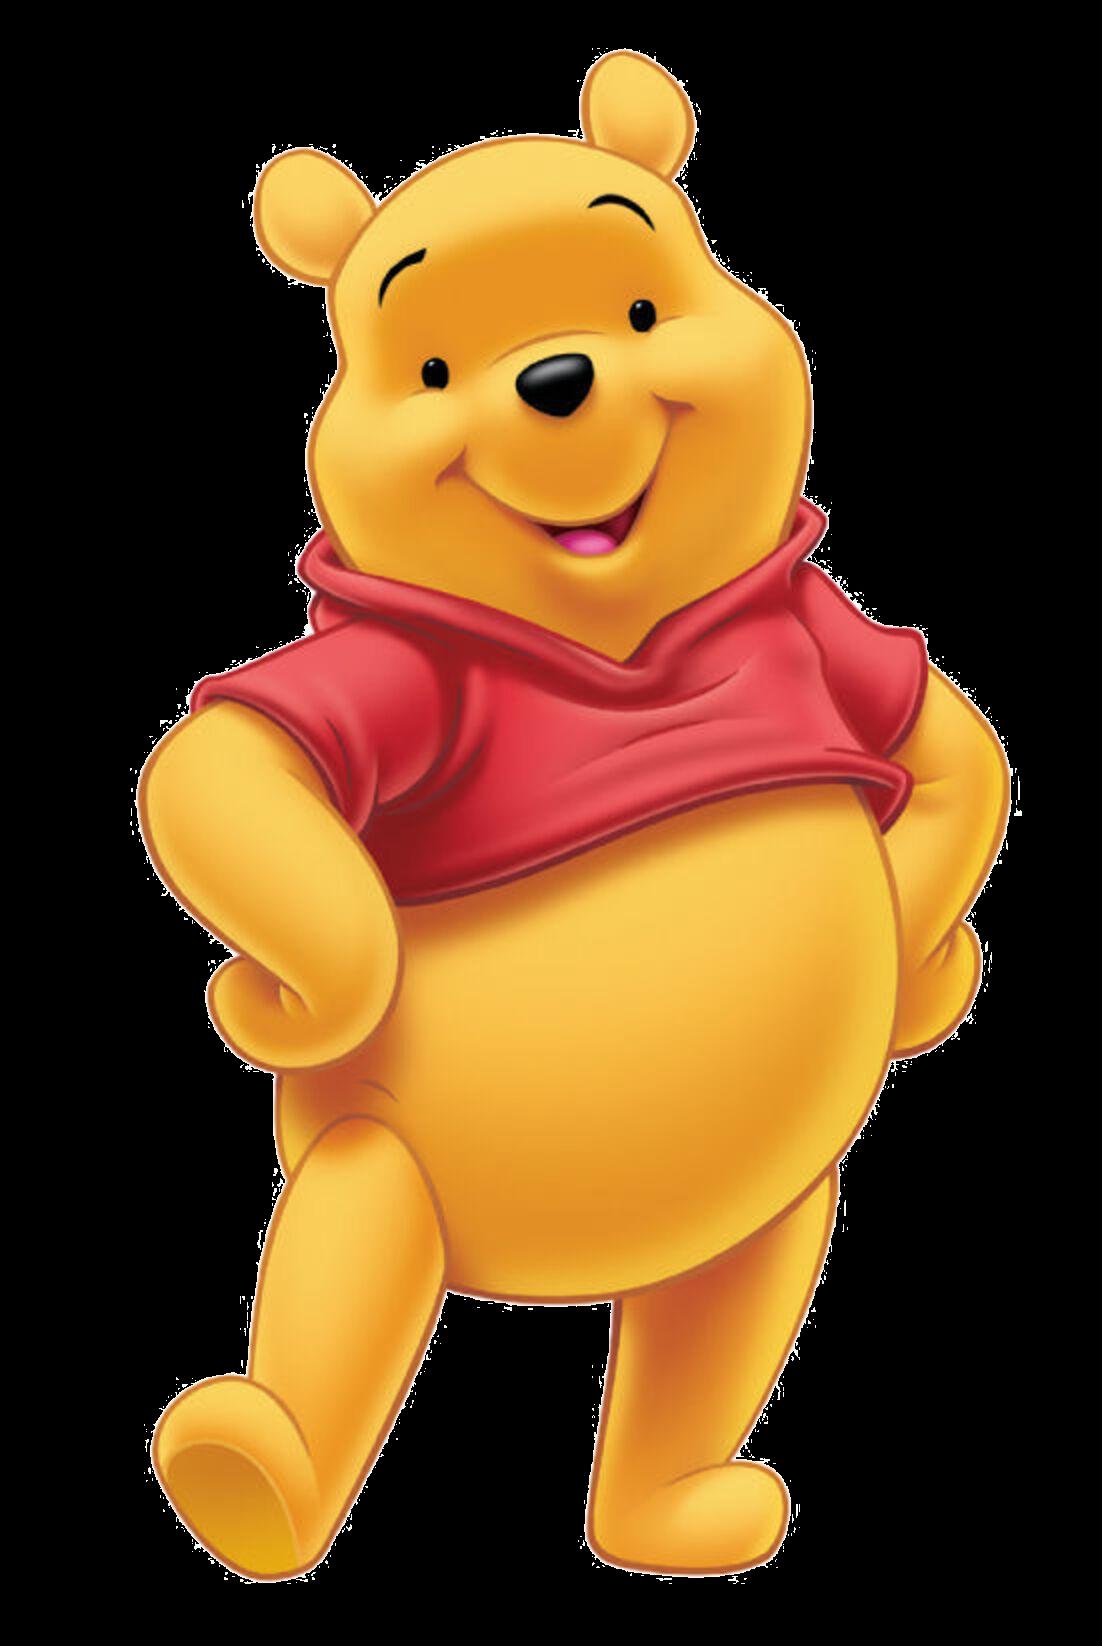 Winnie the Pooh/Gallery - DisneyWiki